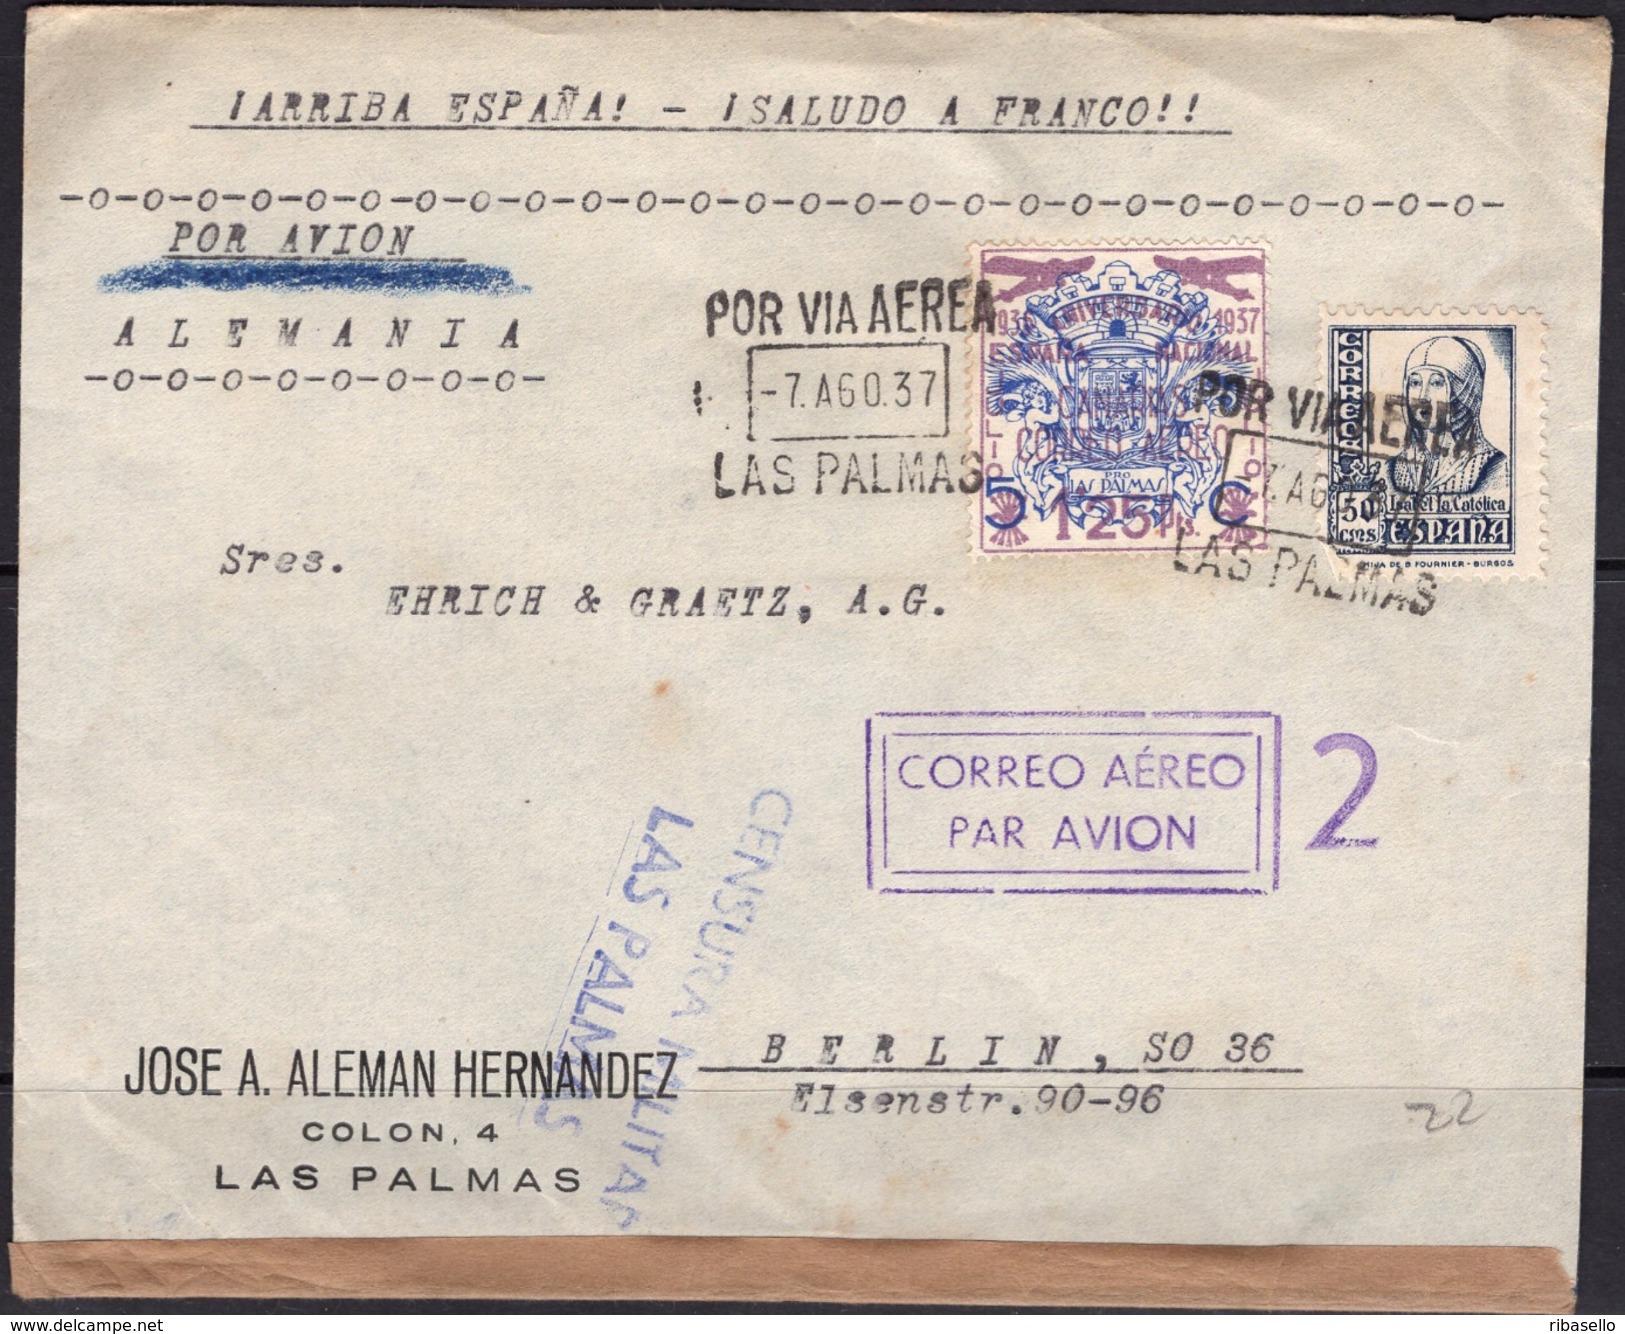 España 1937. Canarias. Carta De Las Palmas A Berlin. Censura. - Marcas De Censura Nacional